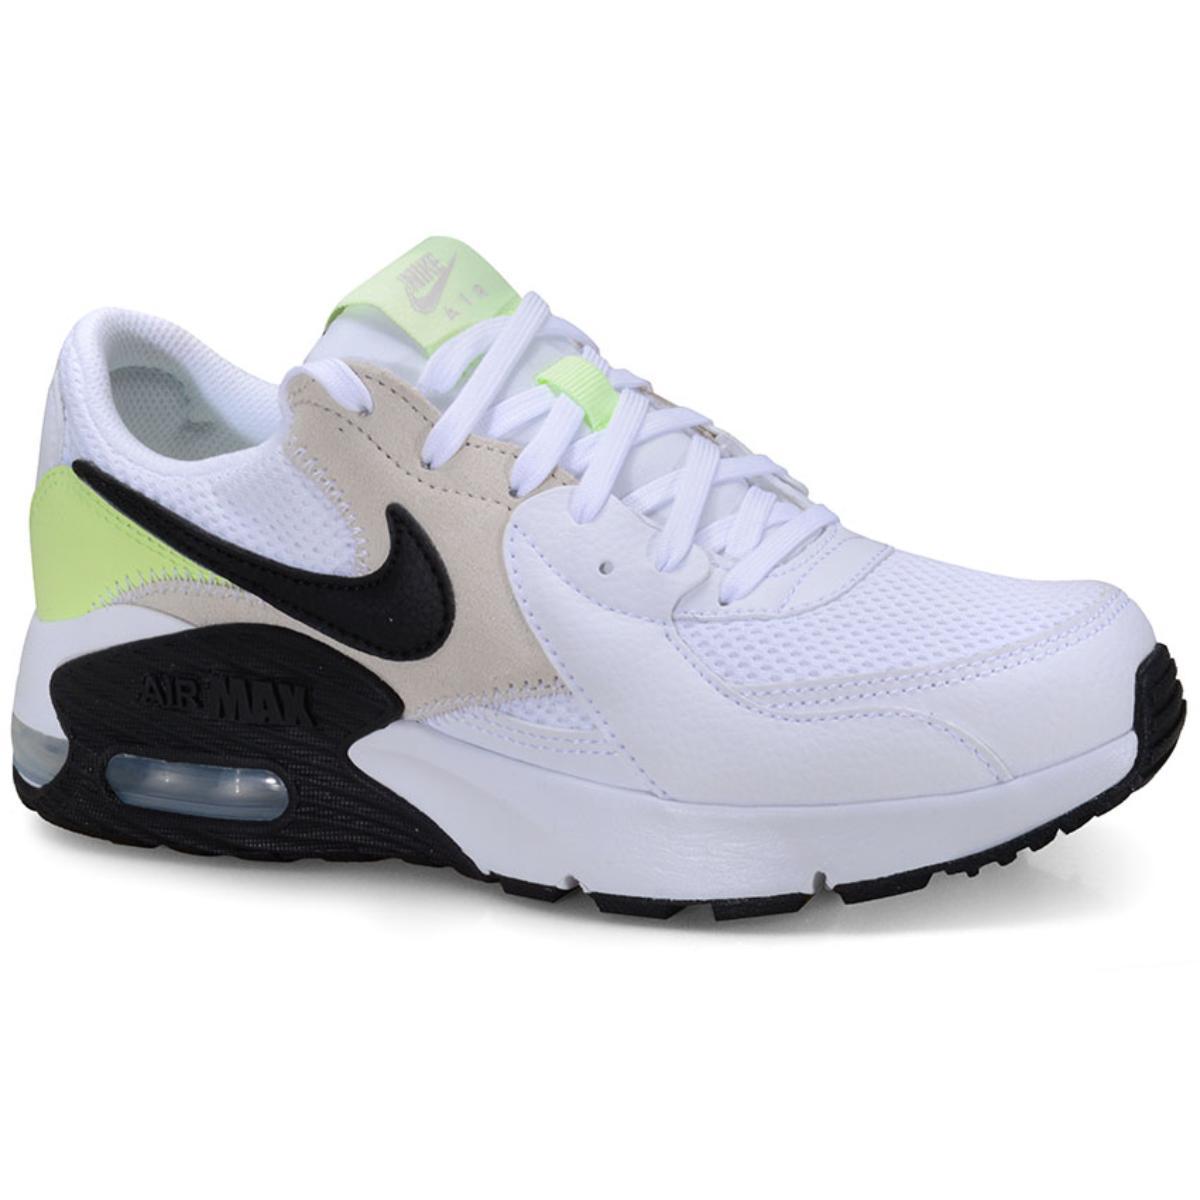 Tênis Feminino Nike Cd5432-105 Air Max Excce Branco/cinza/limão